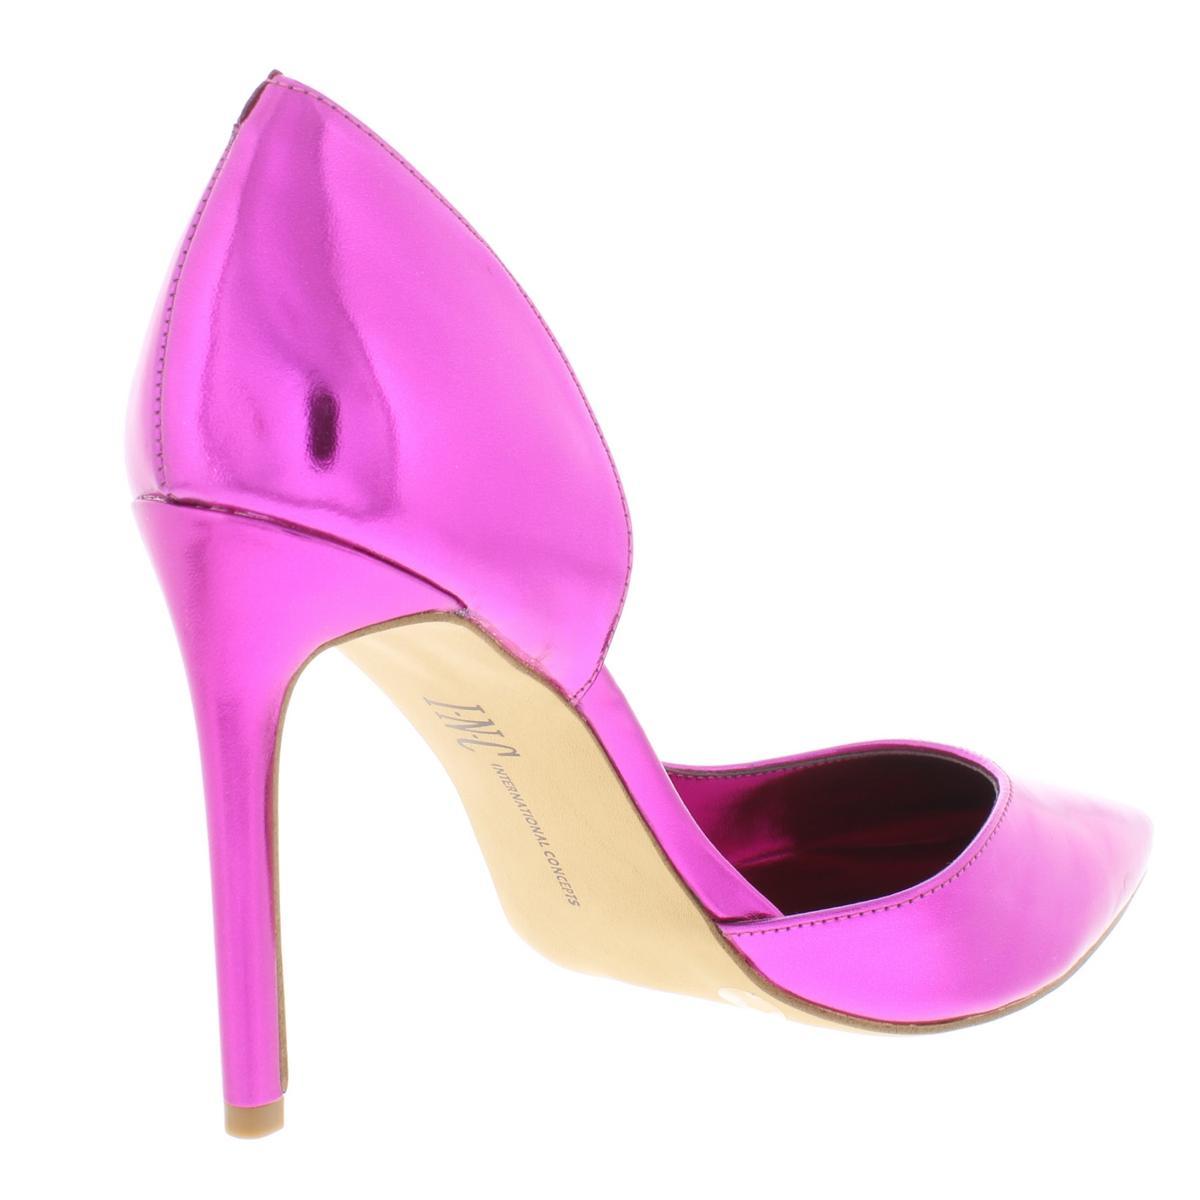 INC-Womens-Kenjay-Padded-Insole-Stiletto-Dress-D-039-Orsay-Heels-Shoes-BHFO-7446 thumbnail 4